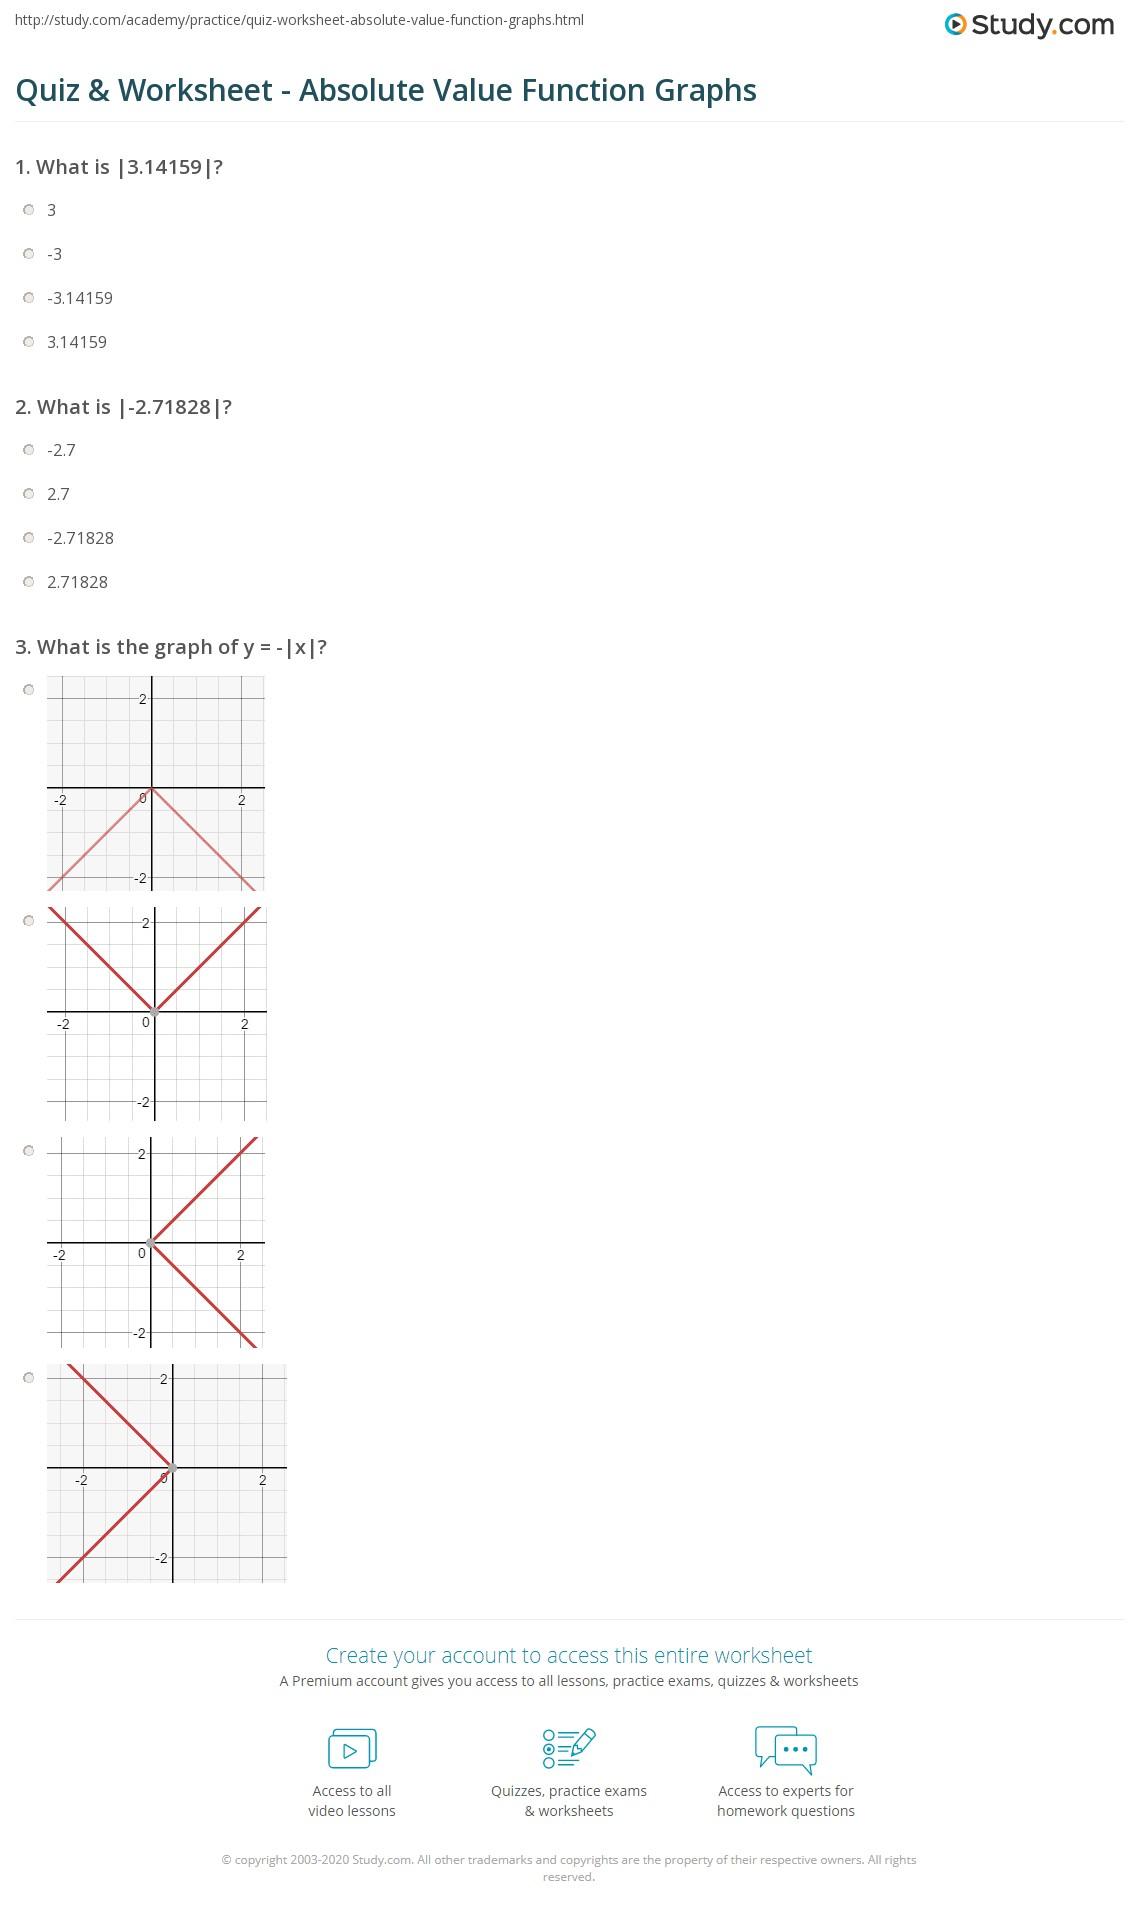 Quiz W Ksheet B Lute V Lue Functi Gr Phs Study